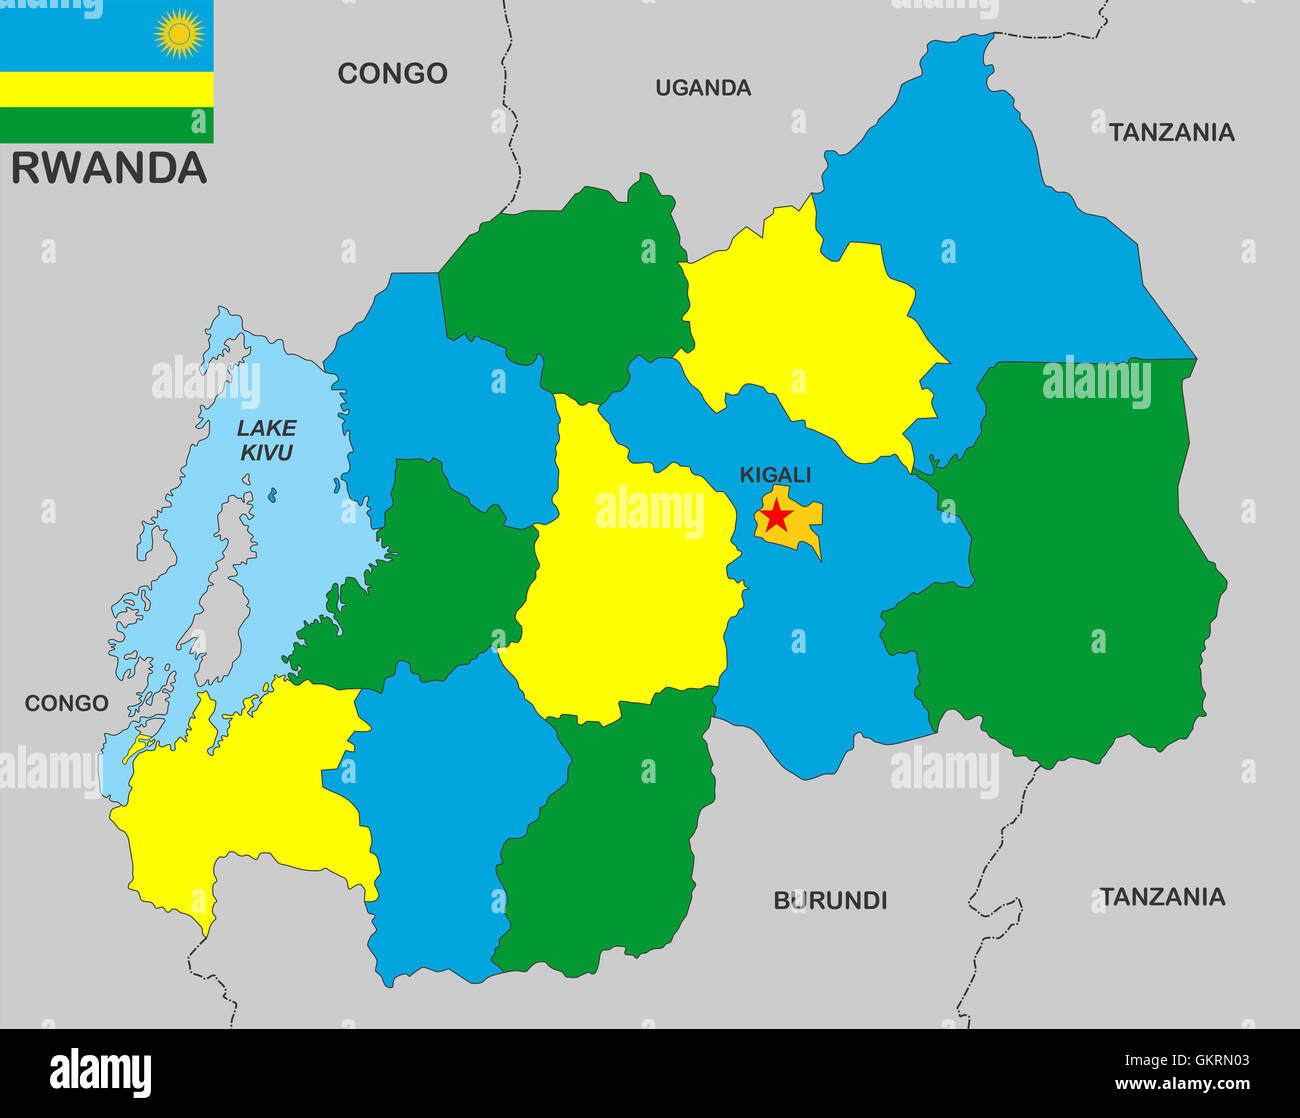 Rwanda Map Stock Photo Royalty Free Image Alamy - Rwanda map